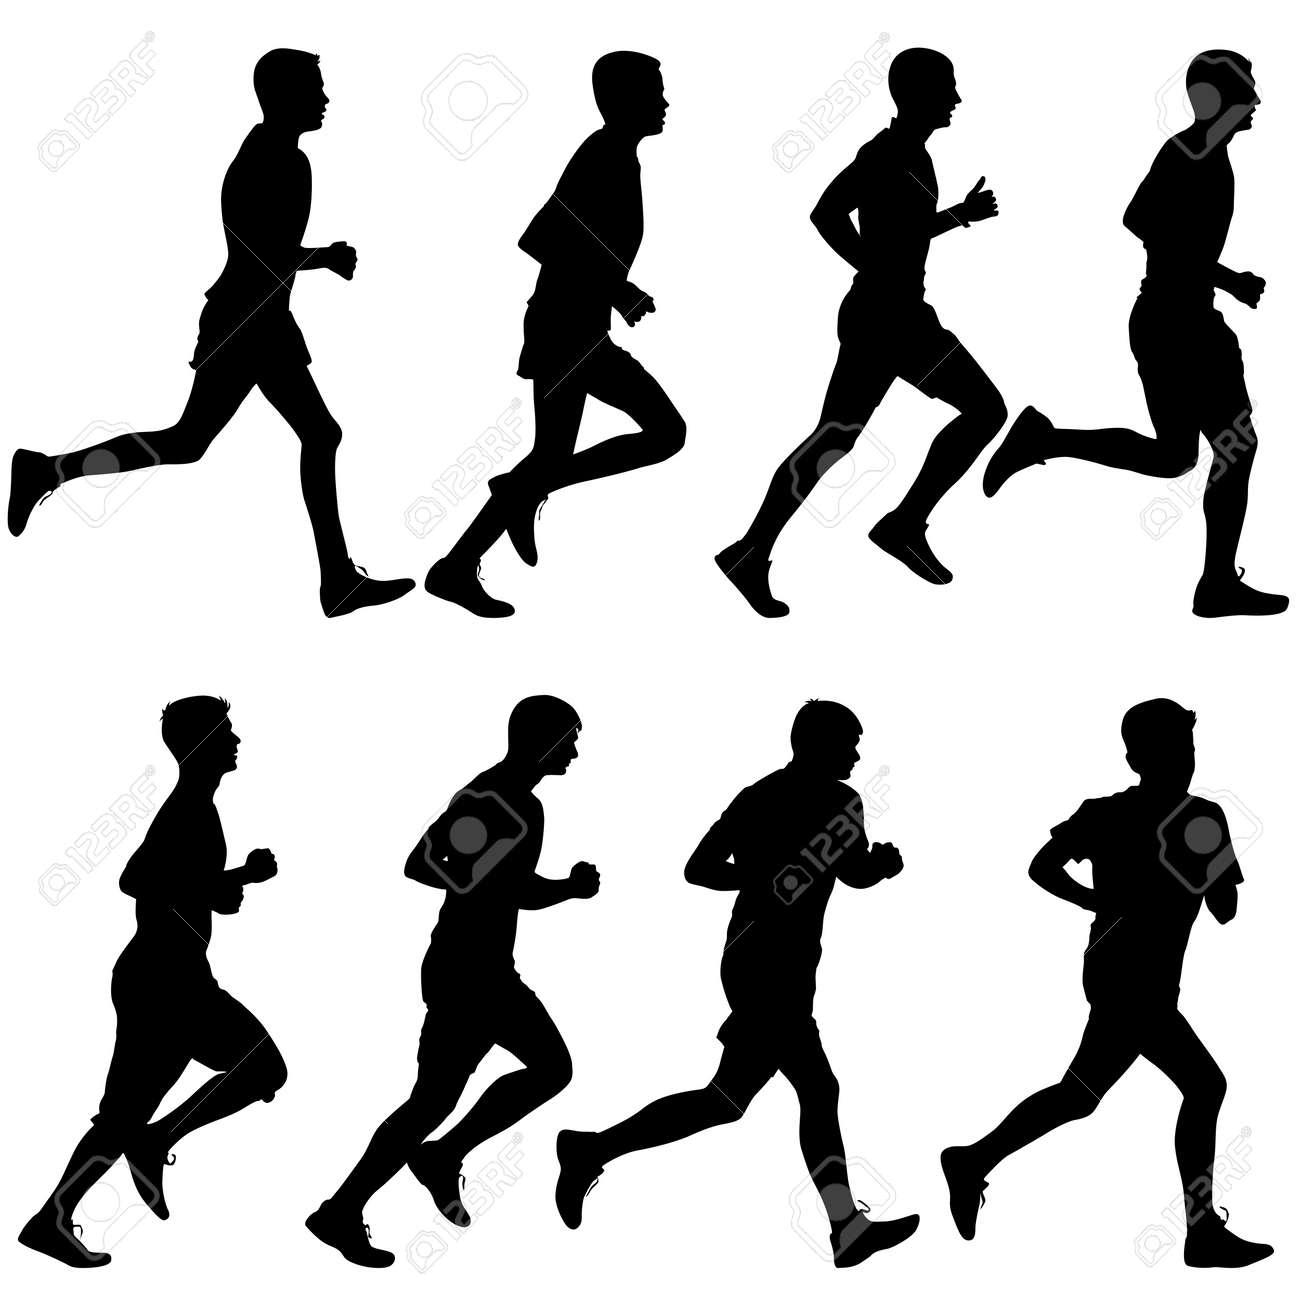 Set of silhouettes. Runners on sprint, men. vector illustration. - 41635559